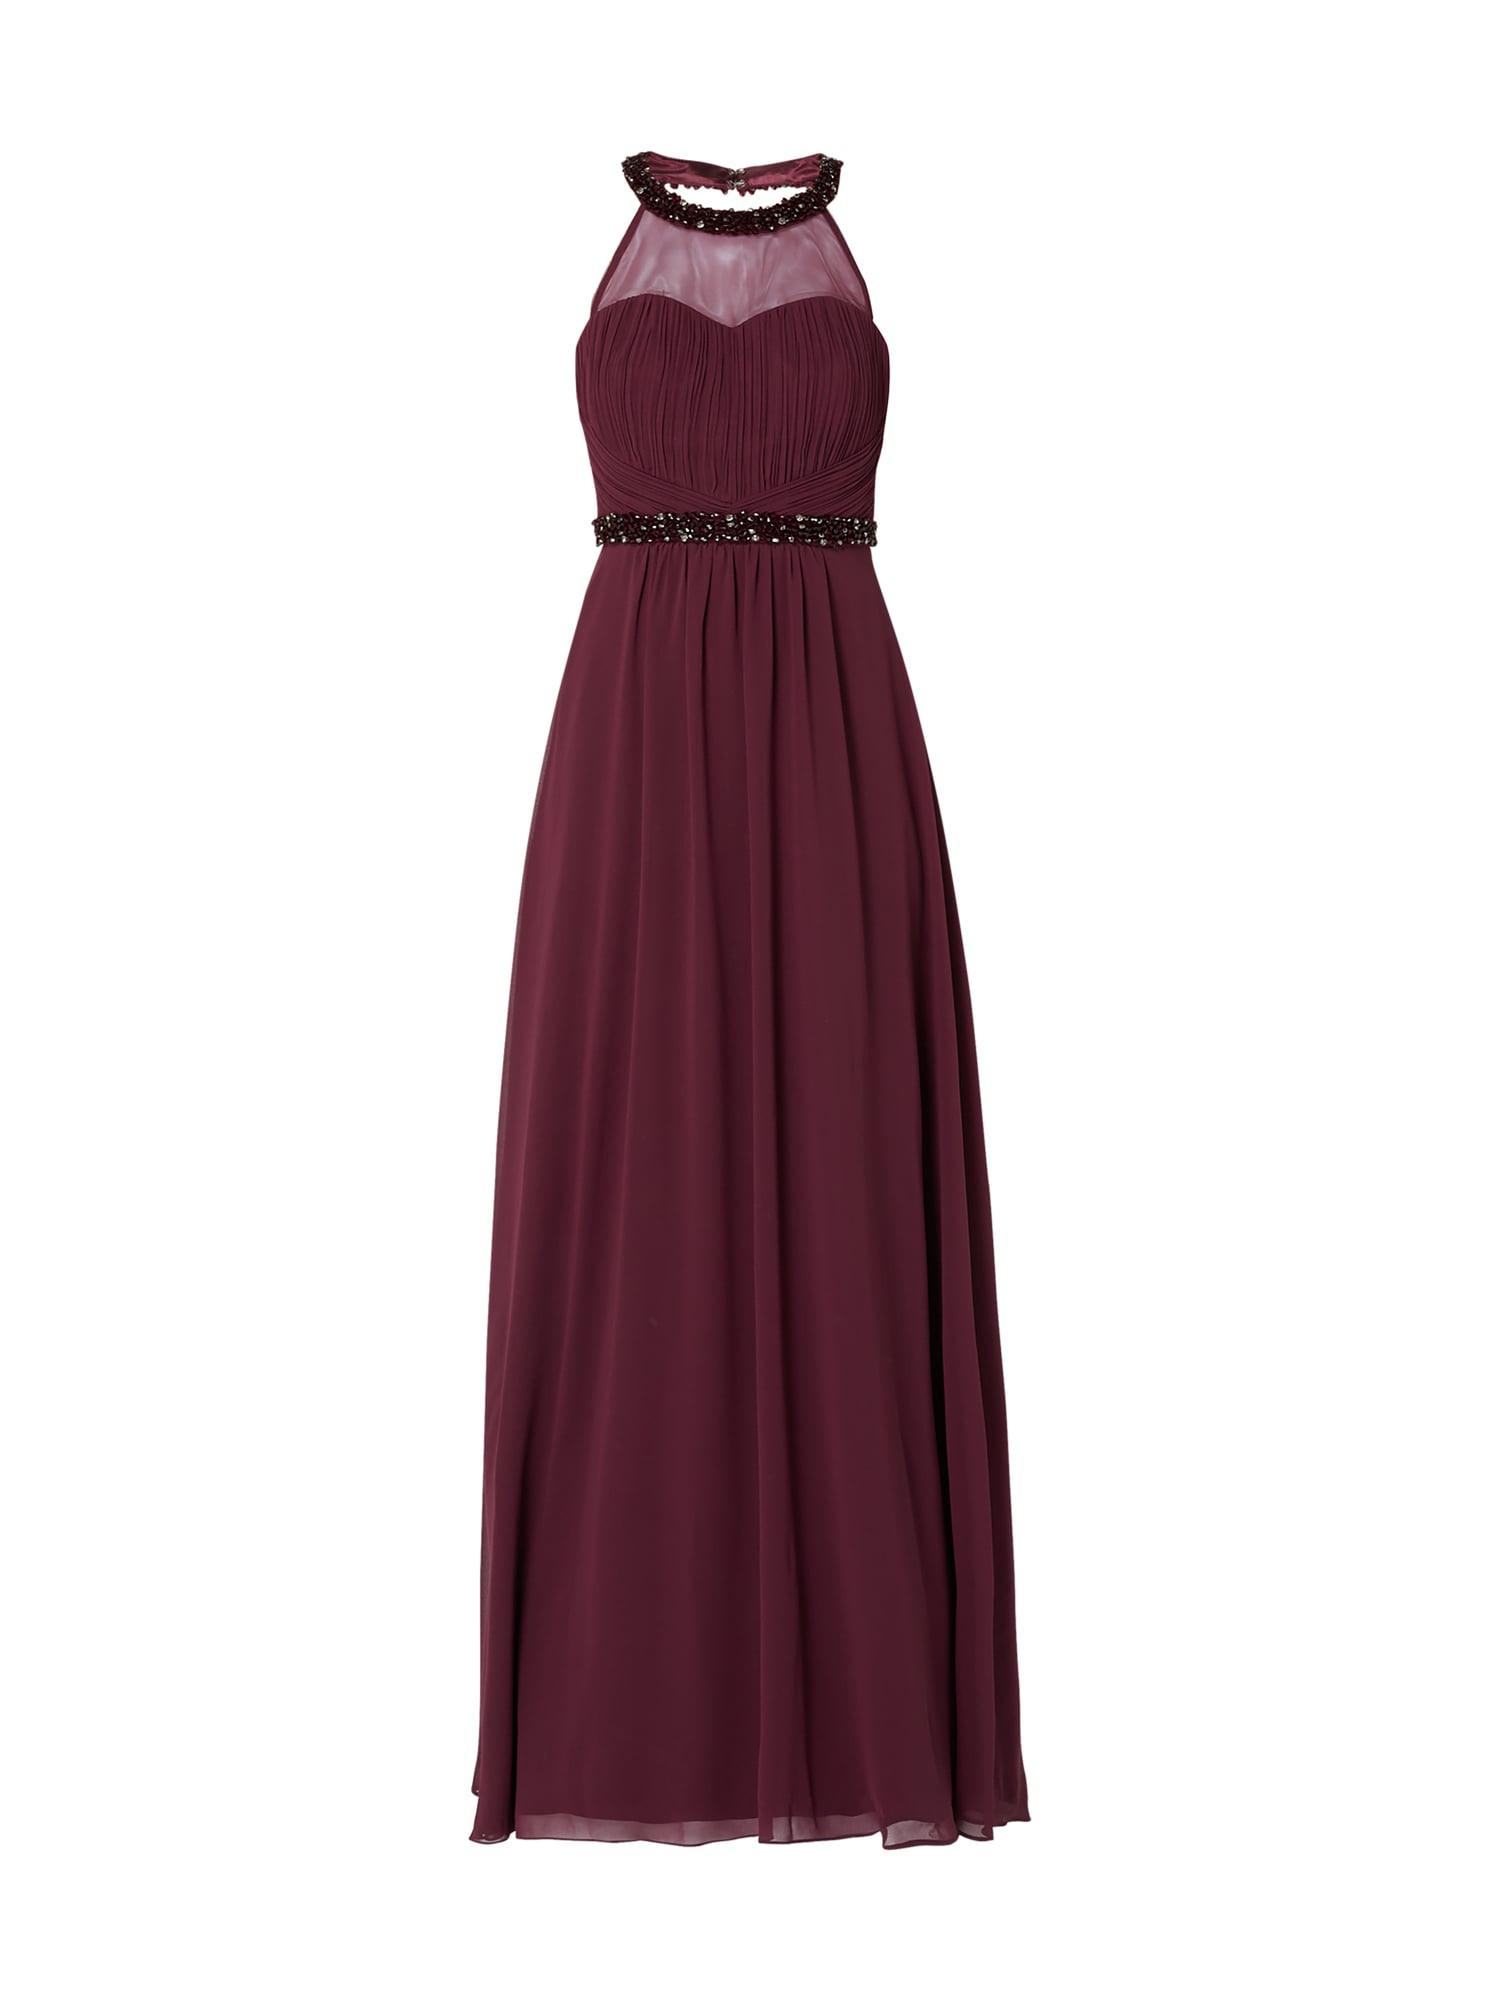 Designer Genial Abendkleid In Rot Vertrieb10 Spektakulär Abendkleid In Rot Galerie